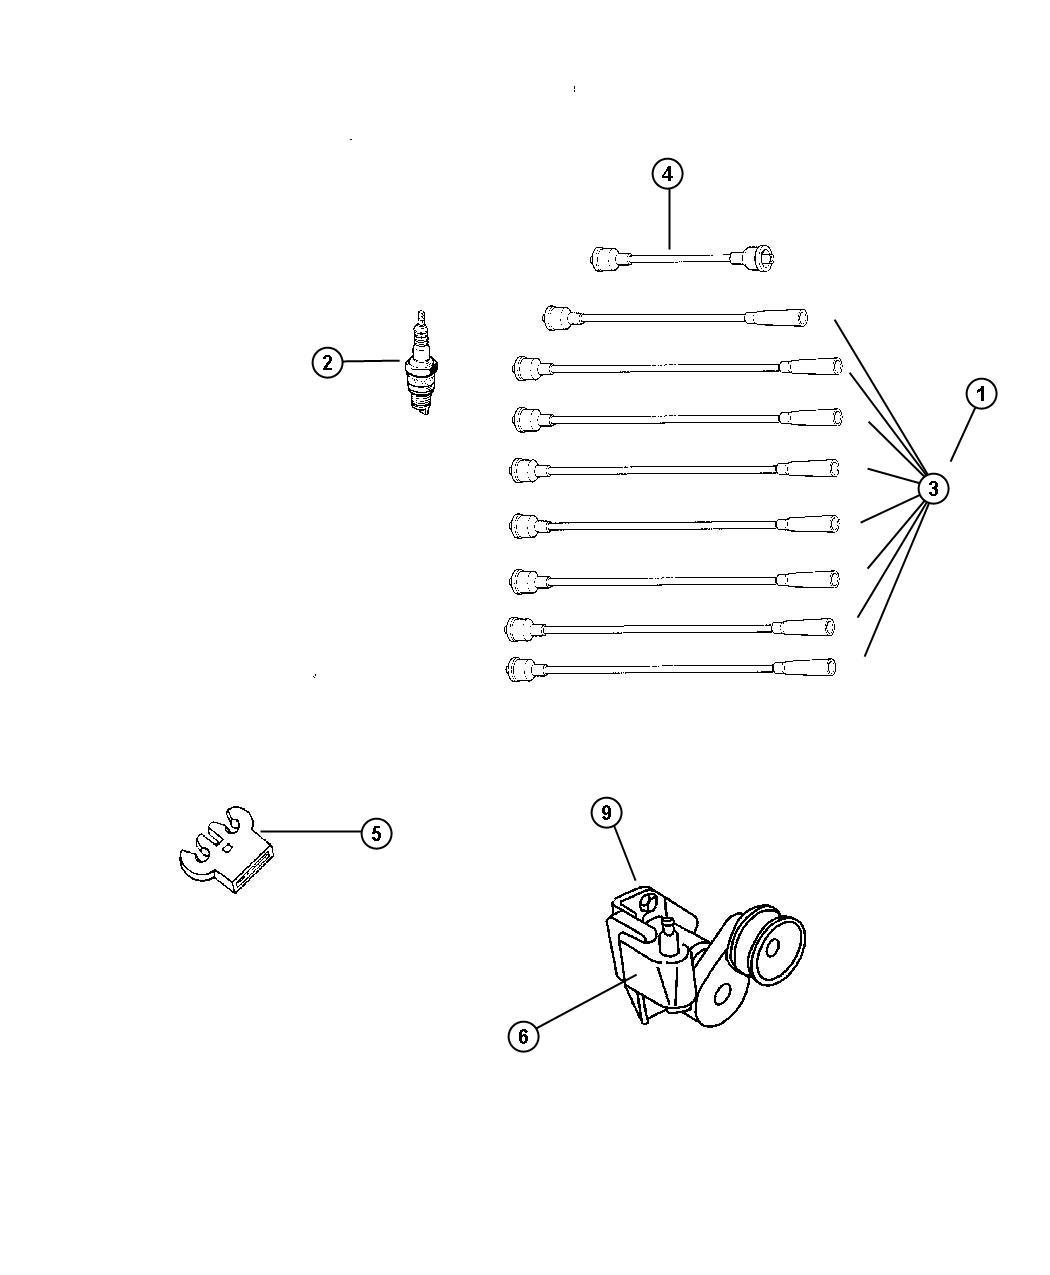 Dodge Challenger Spark Plug Plugs Engine Ignition